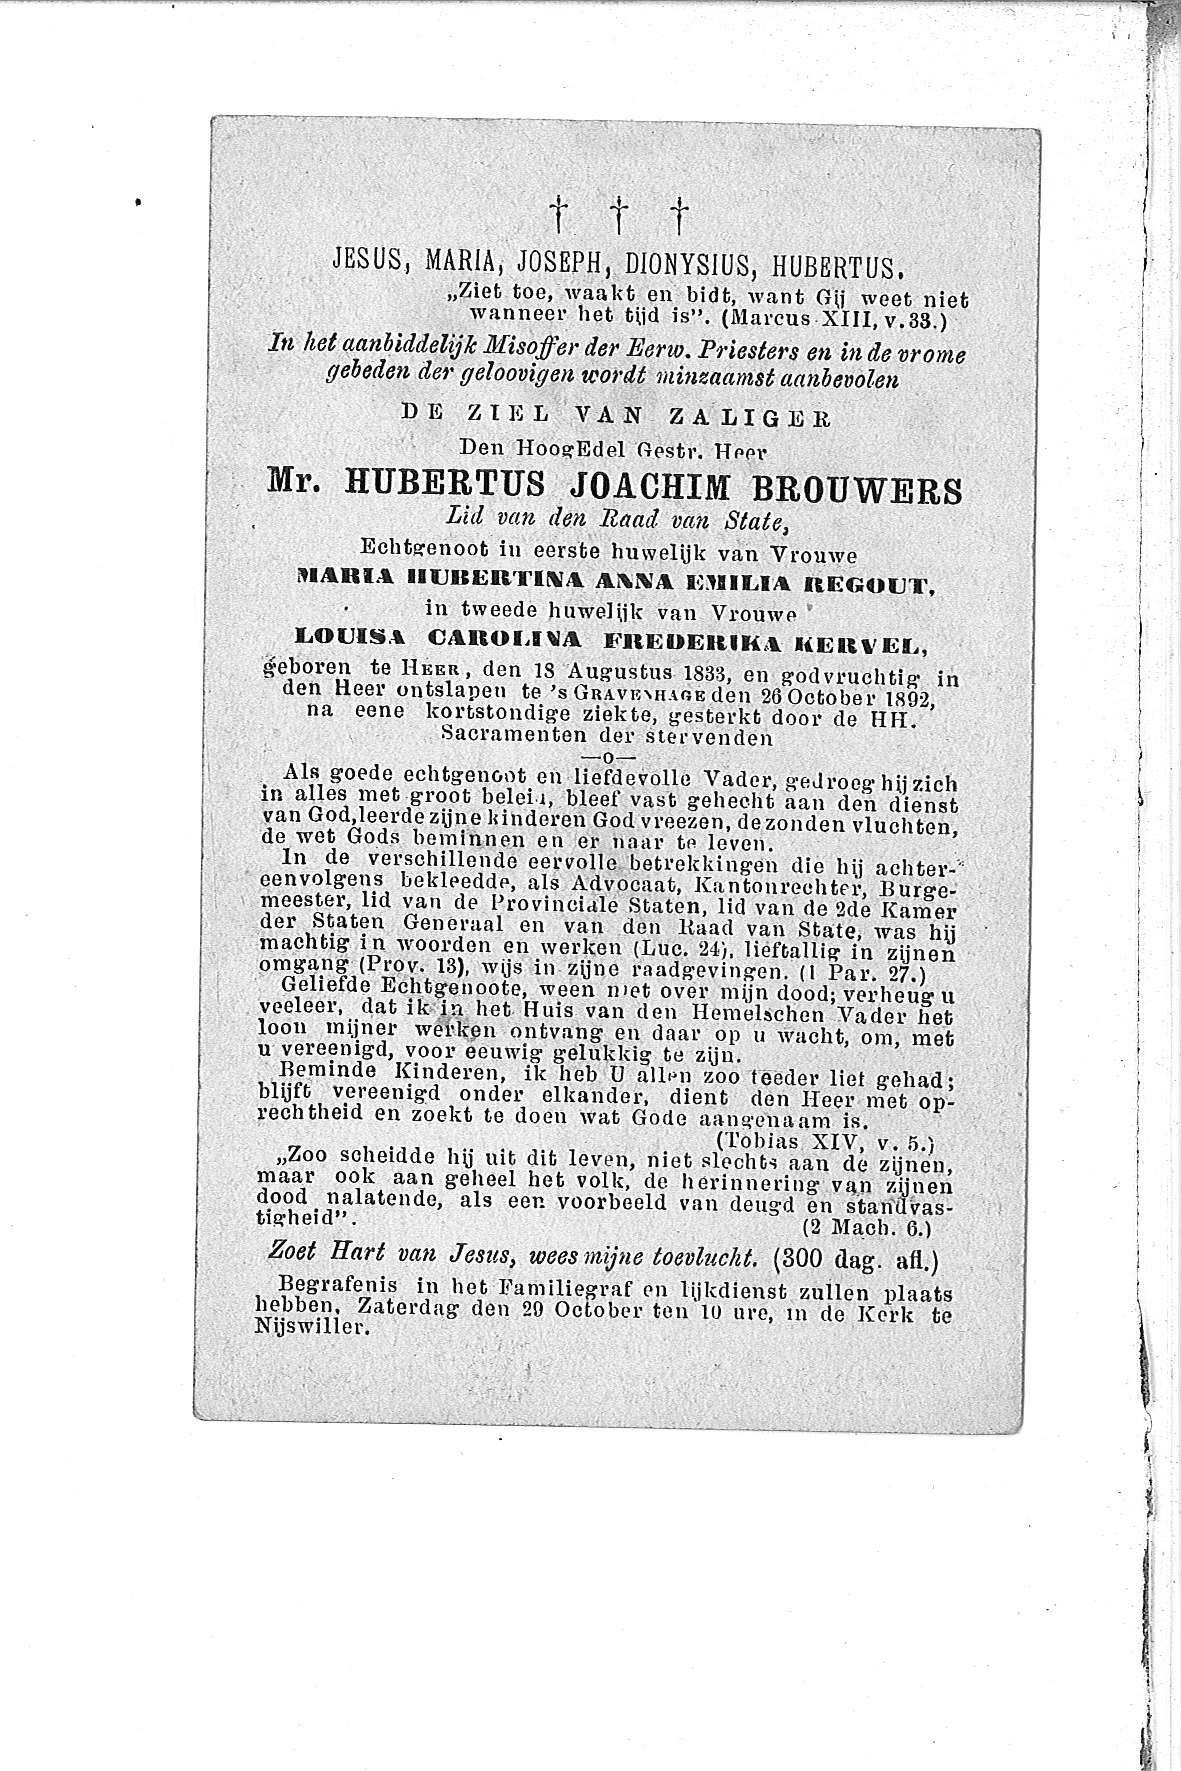 Hubertus Jochim (1892) 20110805165022_00063.jpg